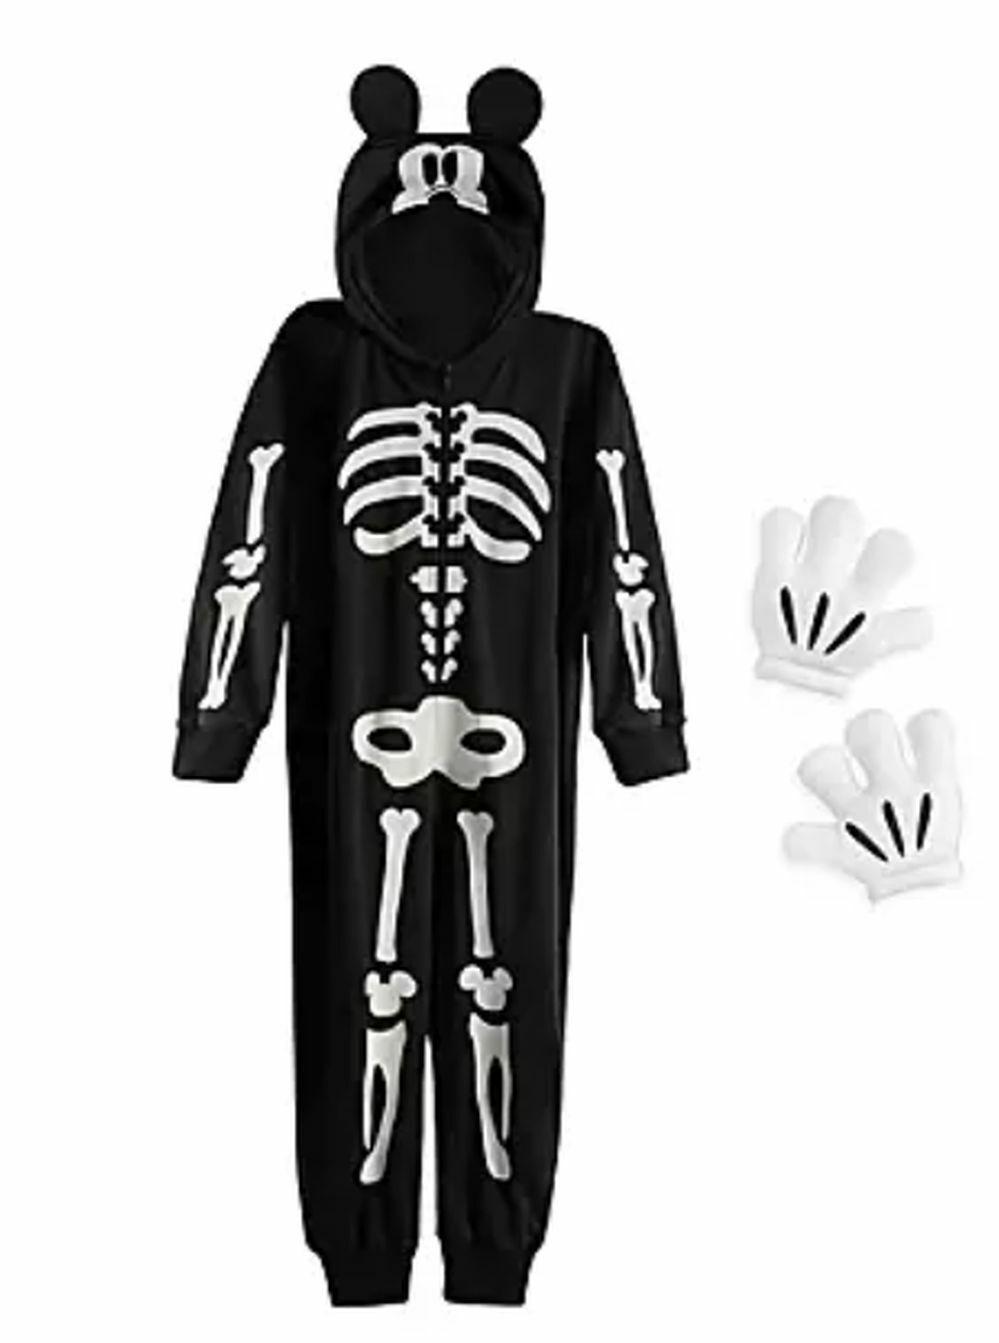 NEW Disney Store 4 year Mickey Mouse Glow In Dark Skeleton Costume Boys Girls